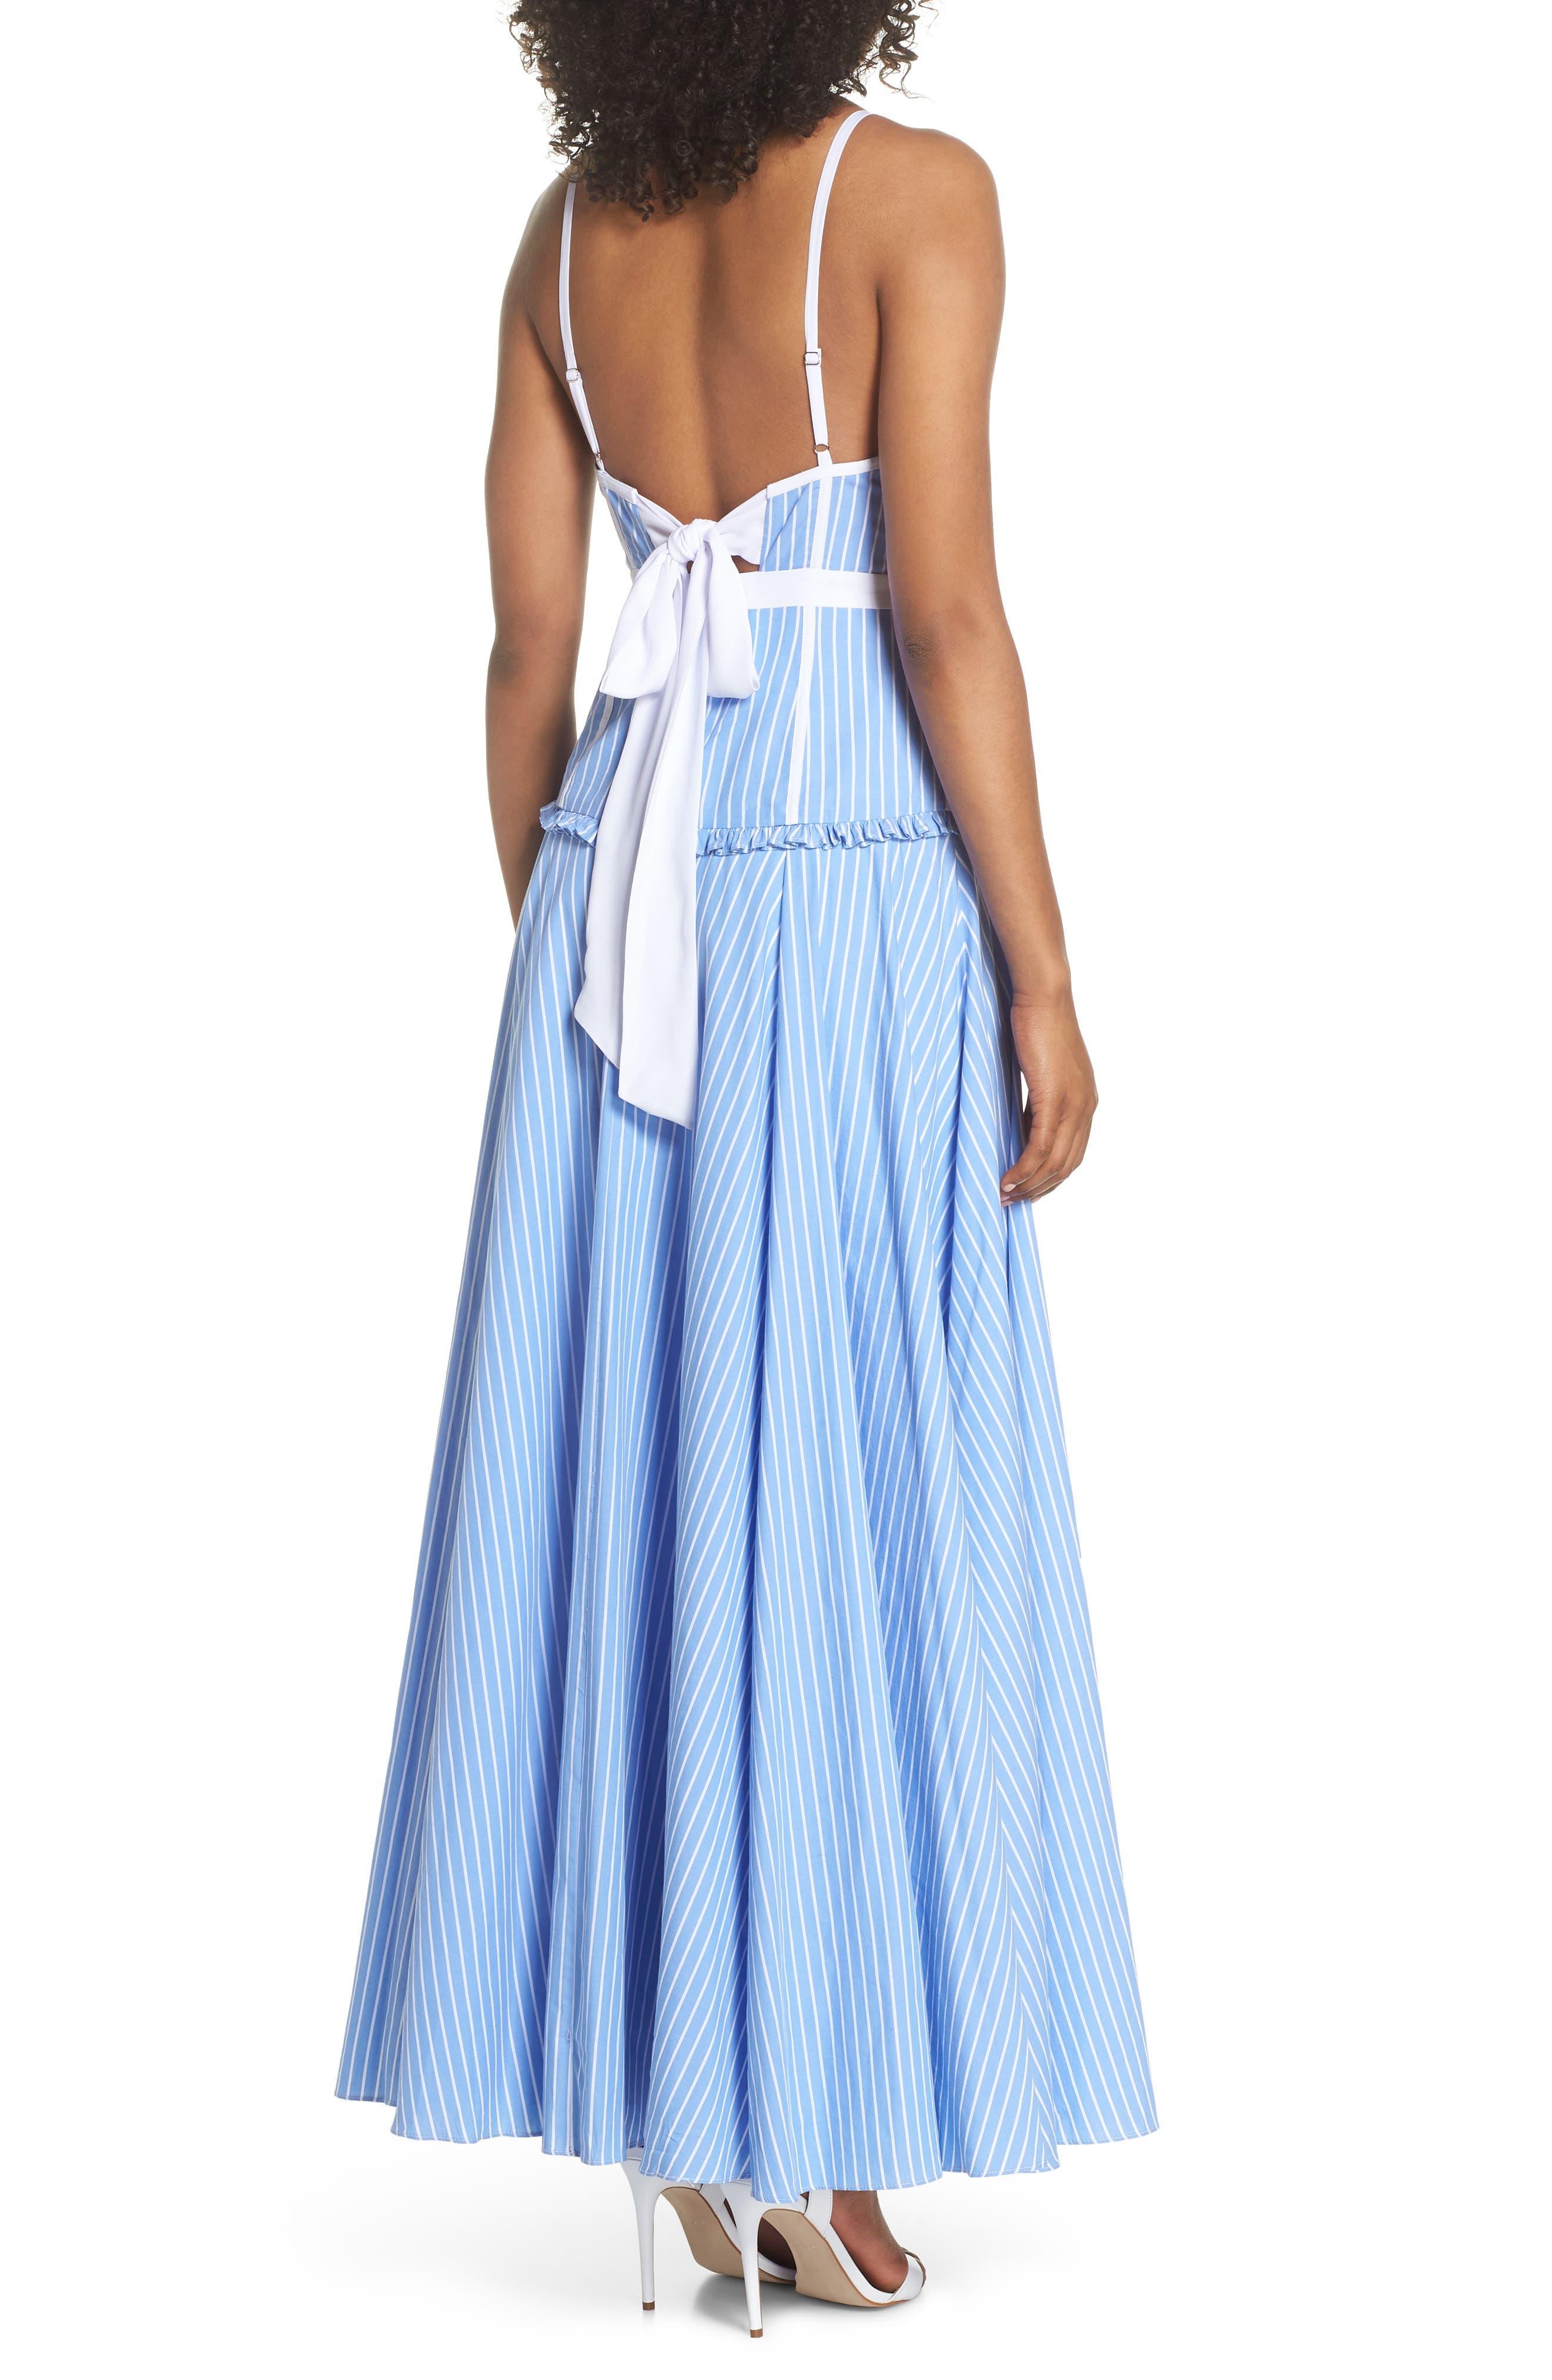 Morrow Stripe Corset Gown,                             Alternate thumbnail 2, color,                             450